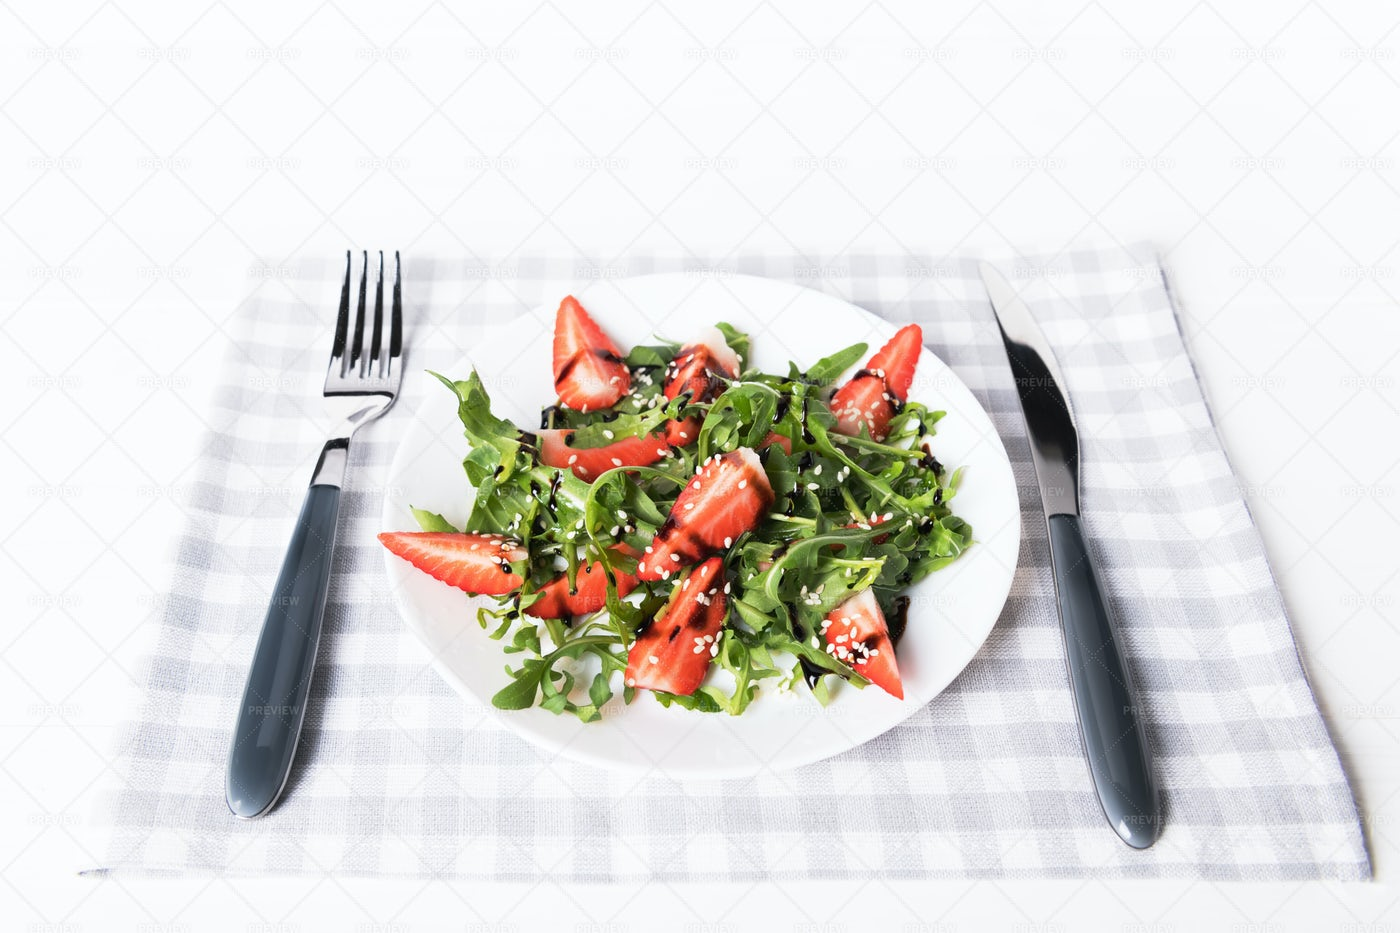 Arugula And Strawberry Dish: Stock Photos